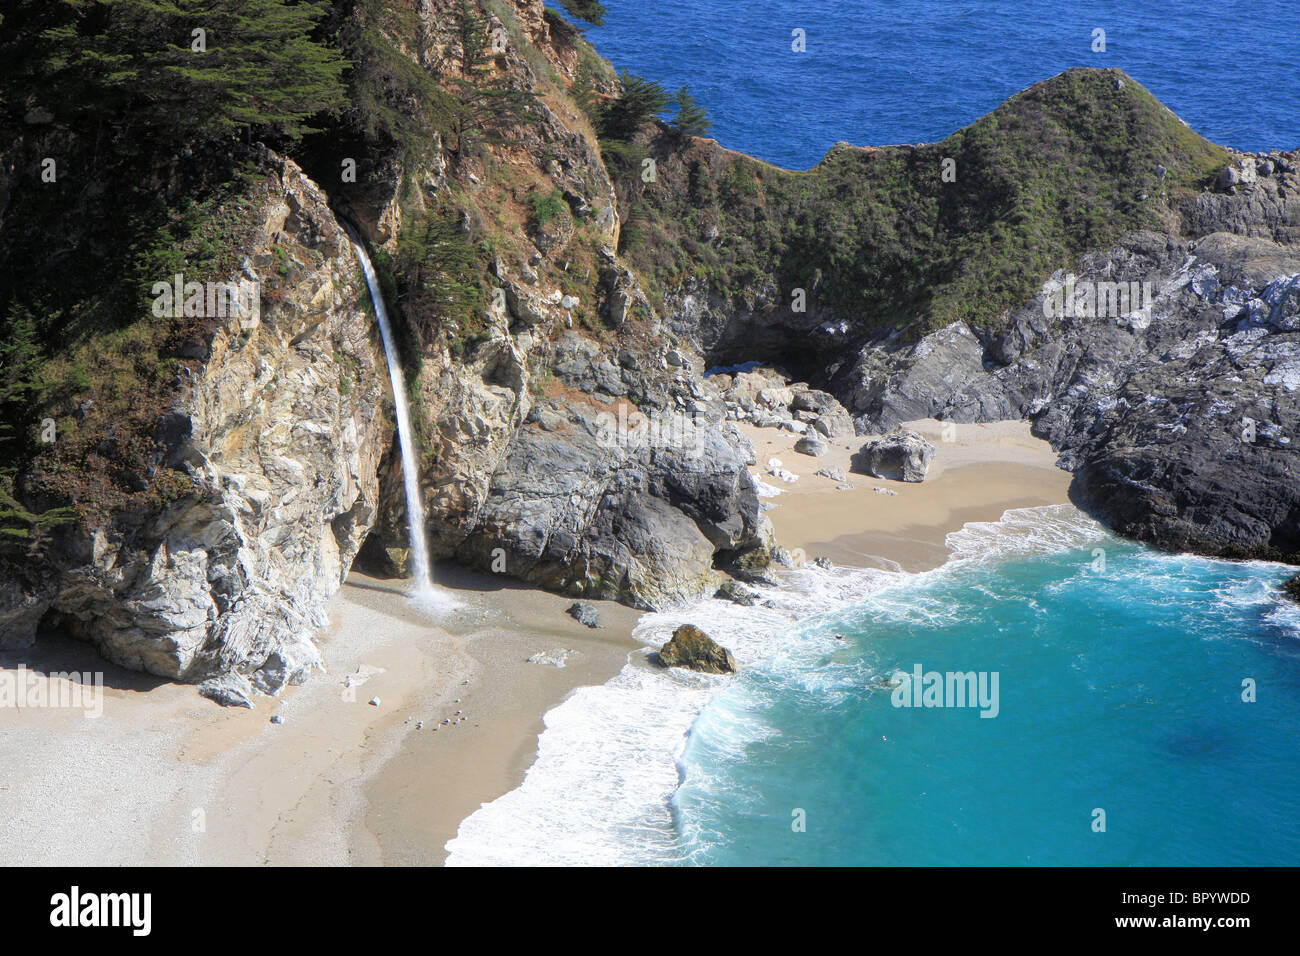 McWay Cove waterfall, California, USA - Stock Image